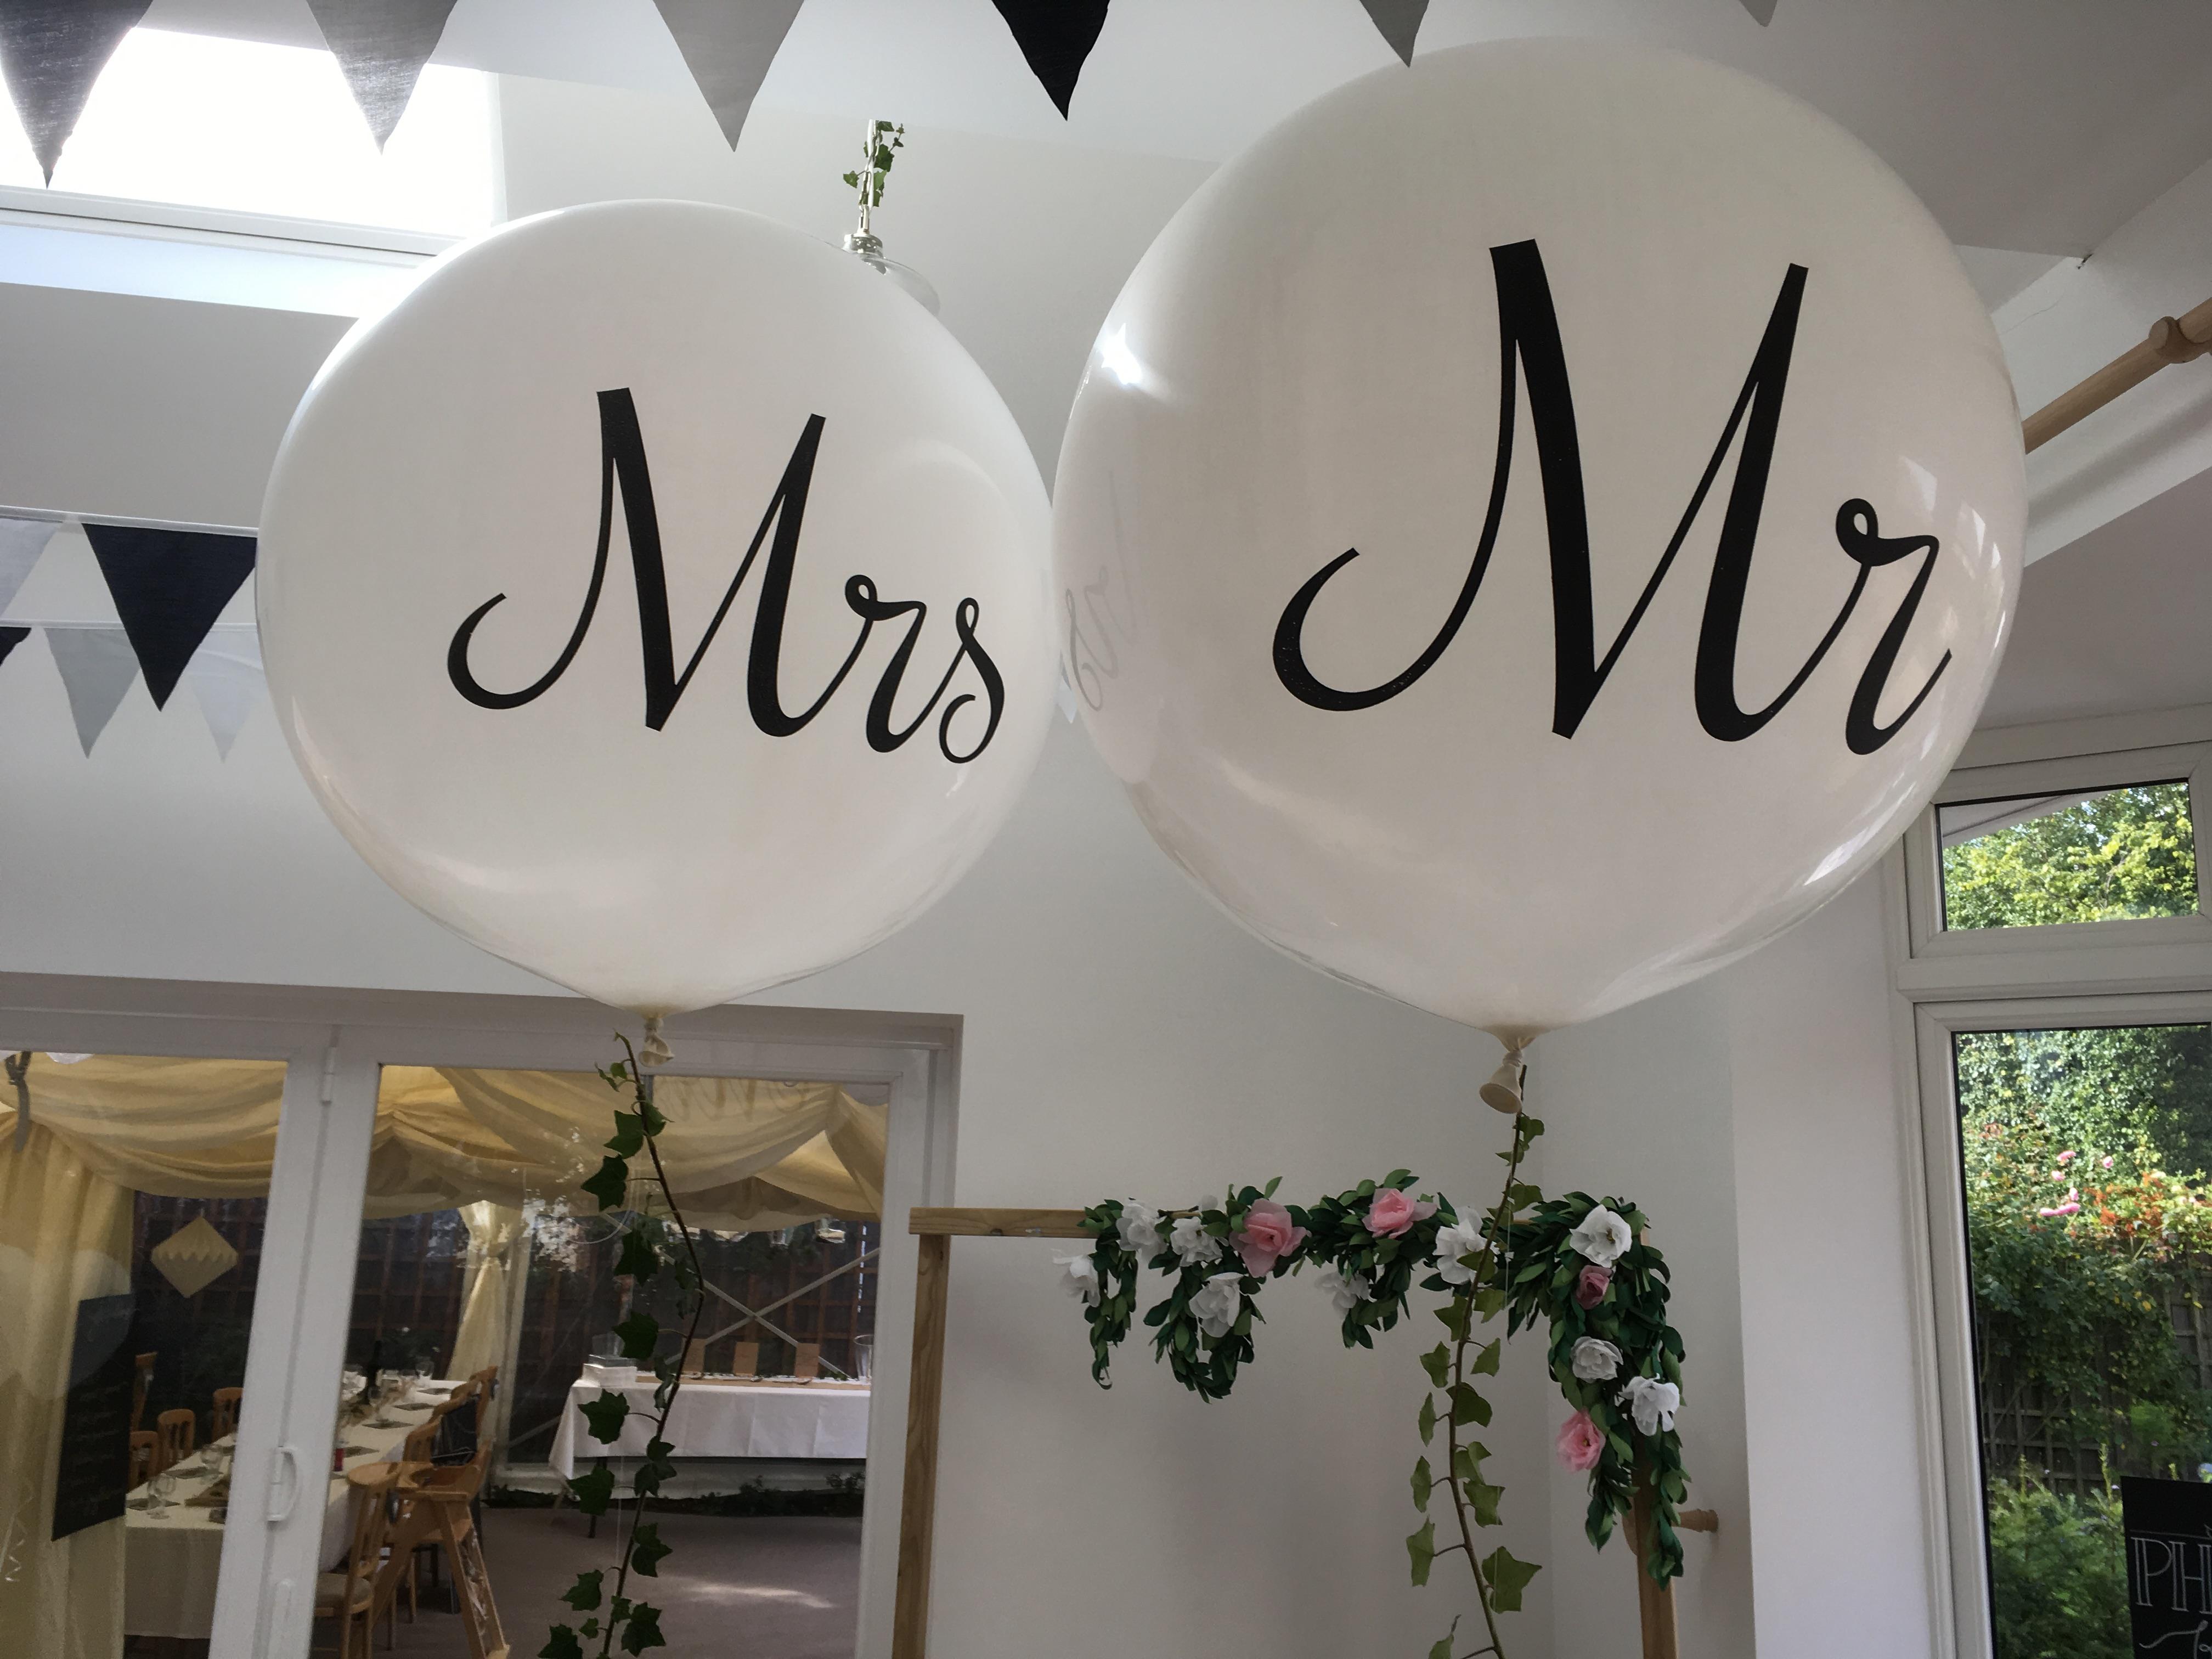 MR & Mrs Ivy Garland Geronimo's